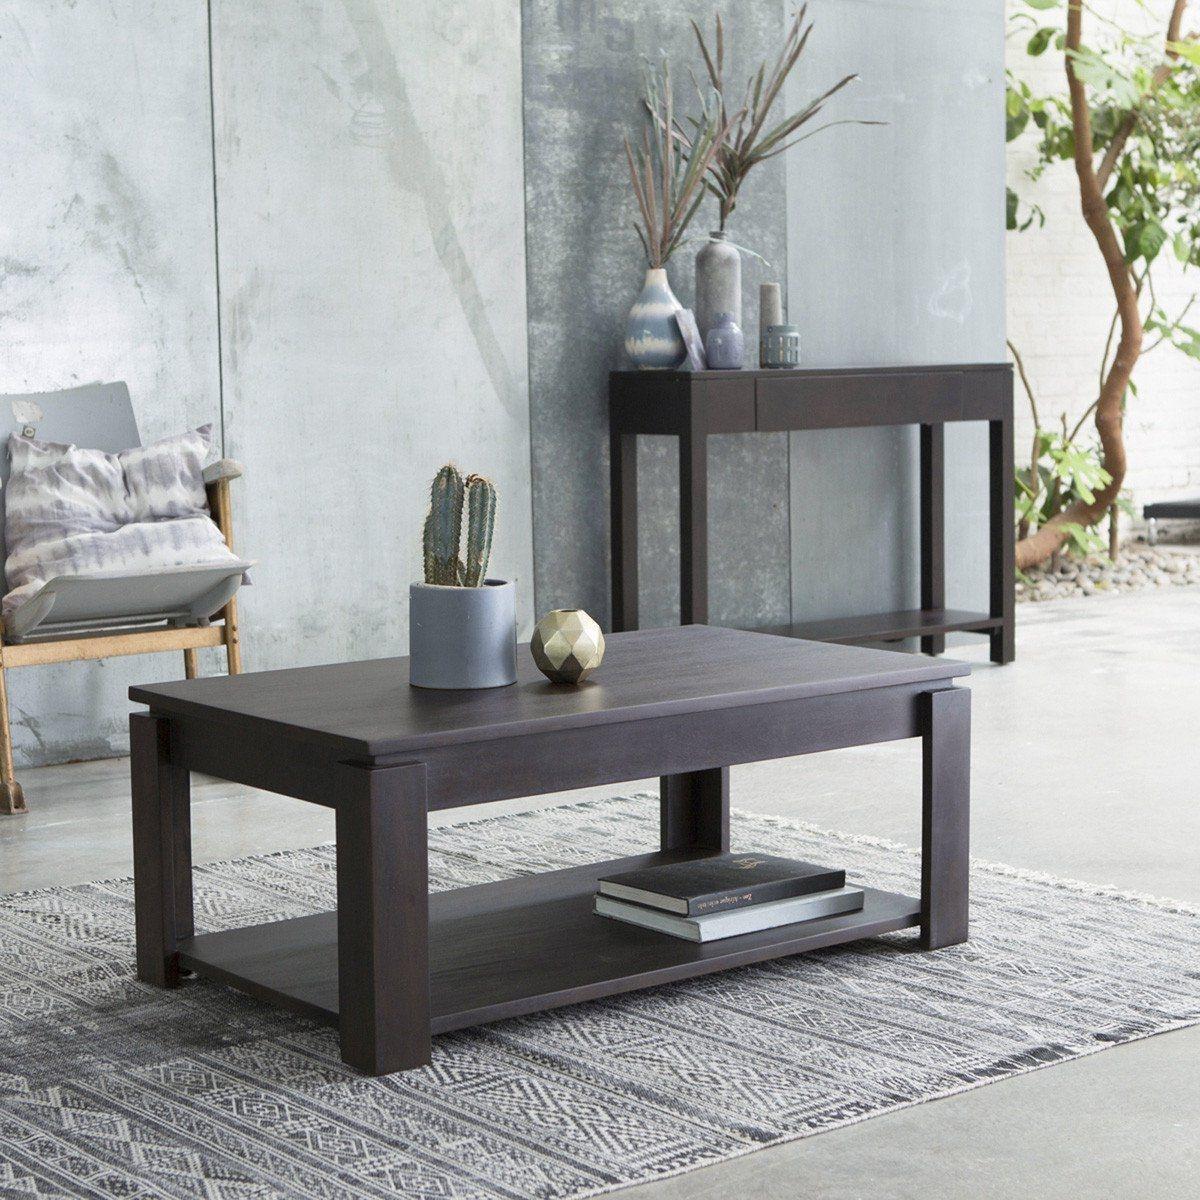 Table basse en bois d'acajou Atlas 100x60